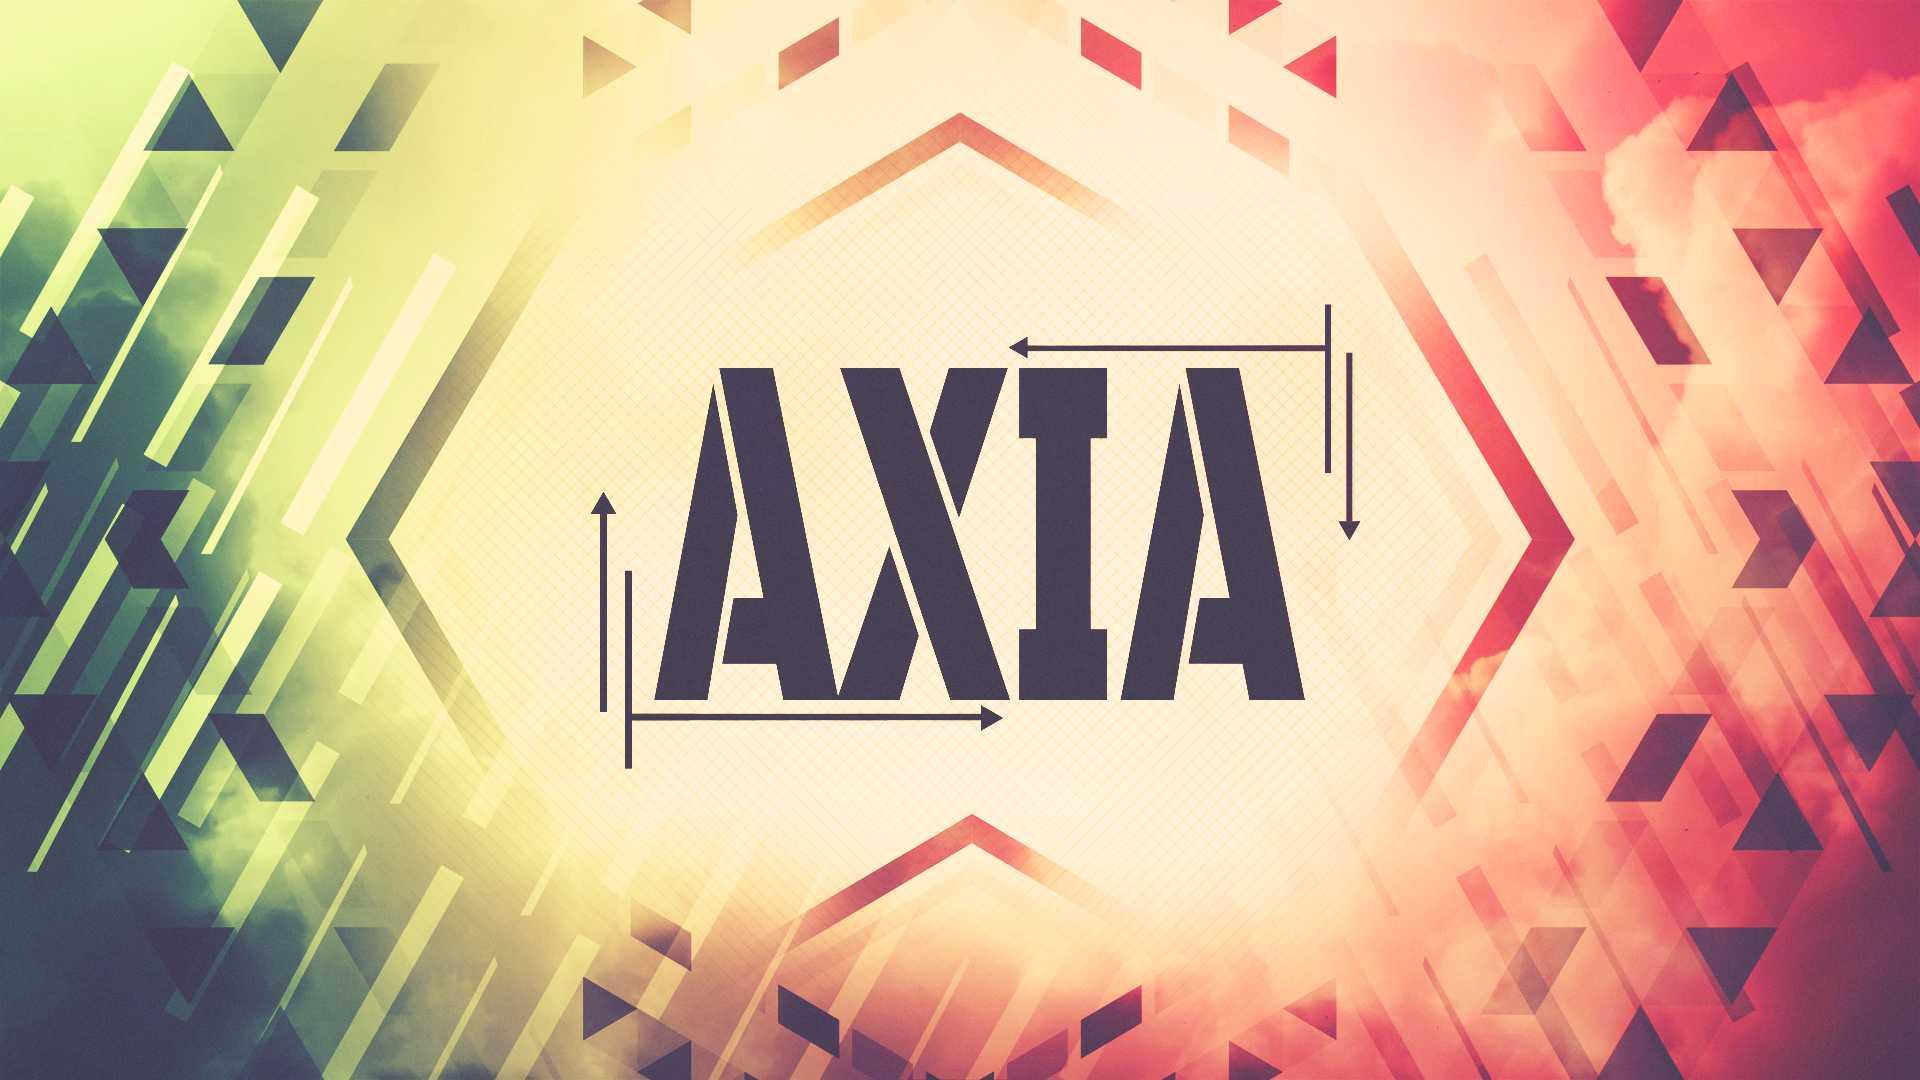 AXIA Graphic.jpg